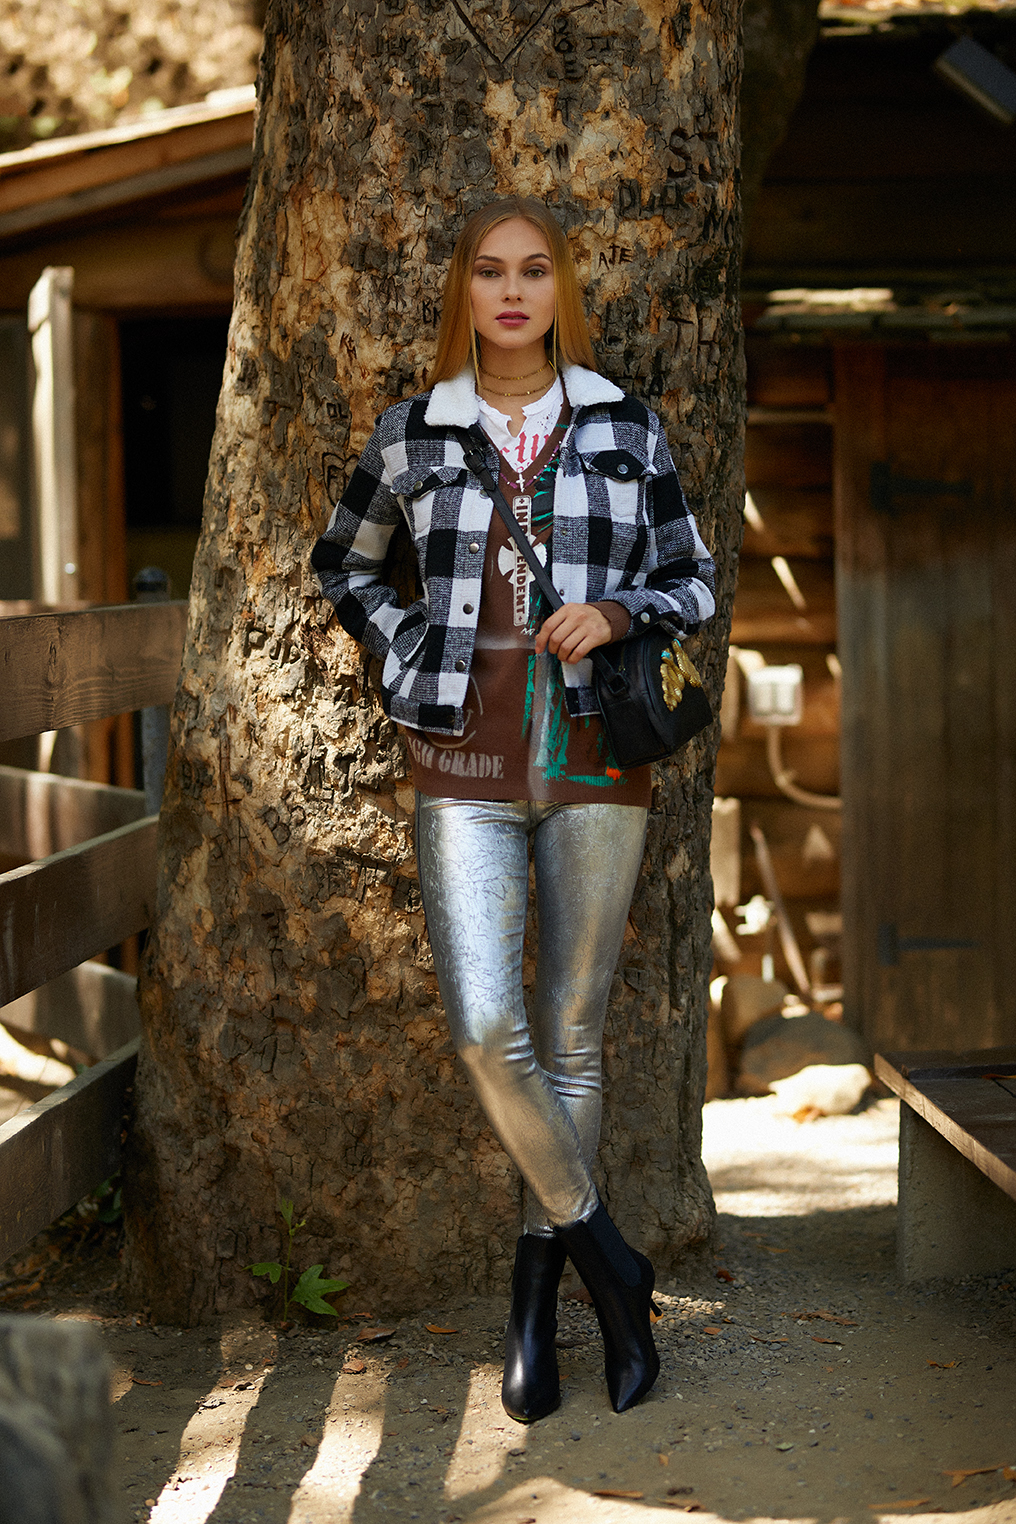 Jacket, WILDFLOWER WOMEN. Sweater and tee-shirt, LOVEWORN. Jeans and boots, JAKE & JONES. Bag, AMBIANCE. Choker necklace, ROWAN. Earrings, LOVEBIRD.